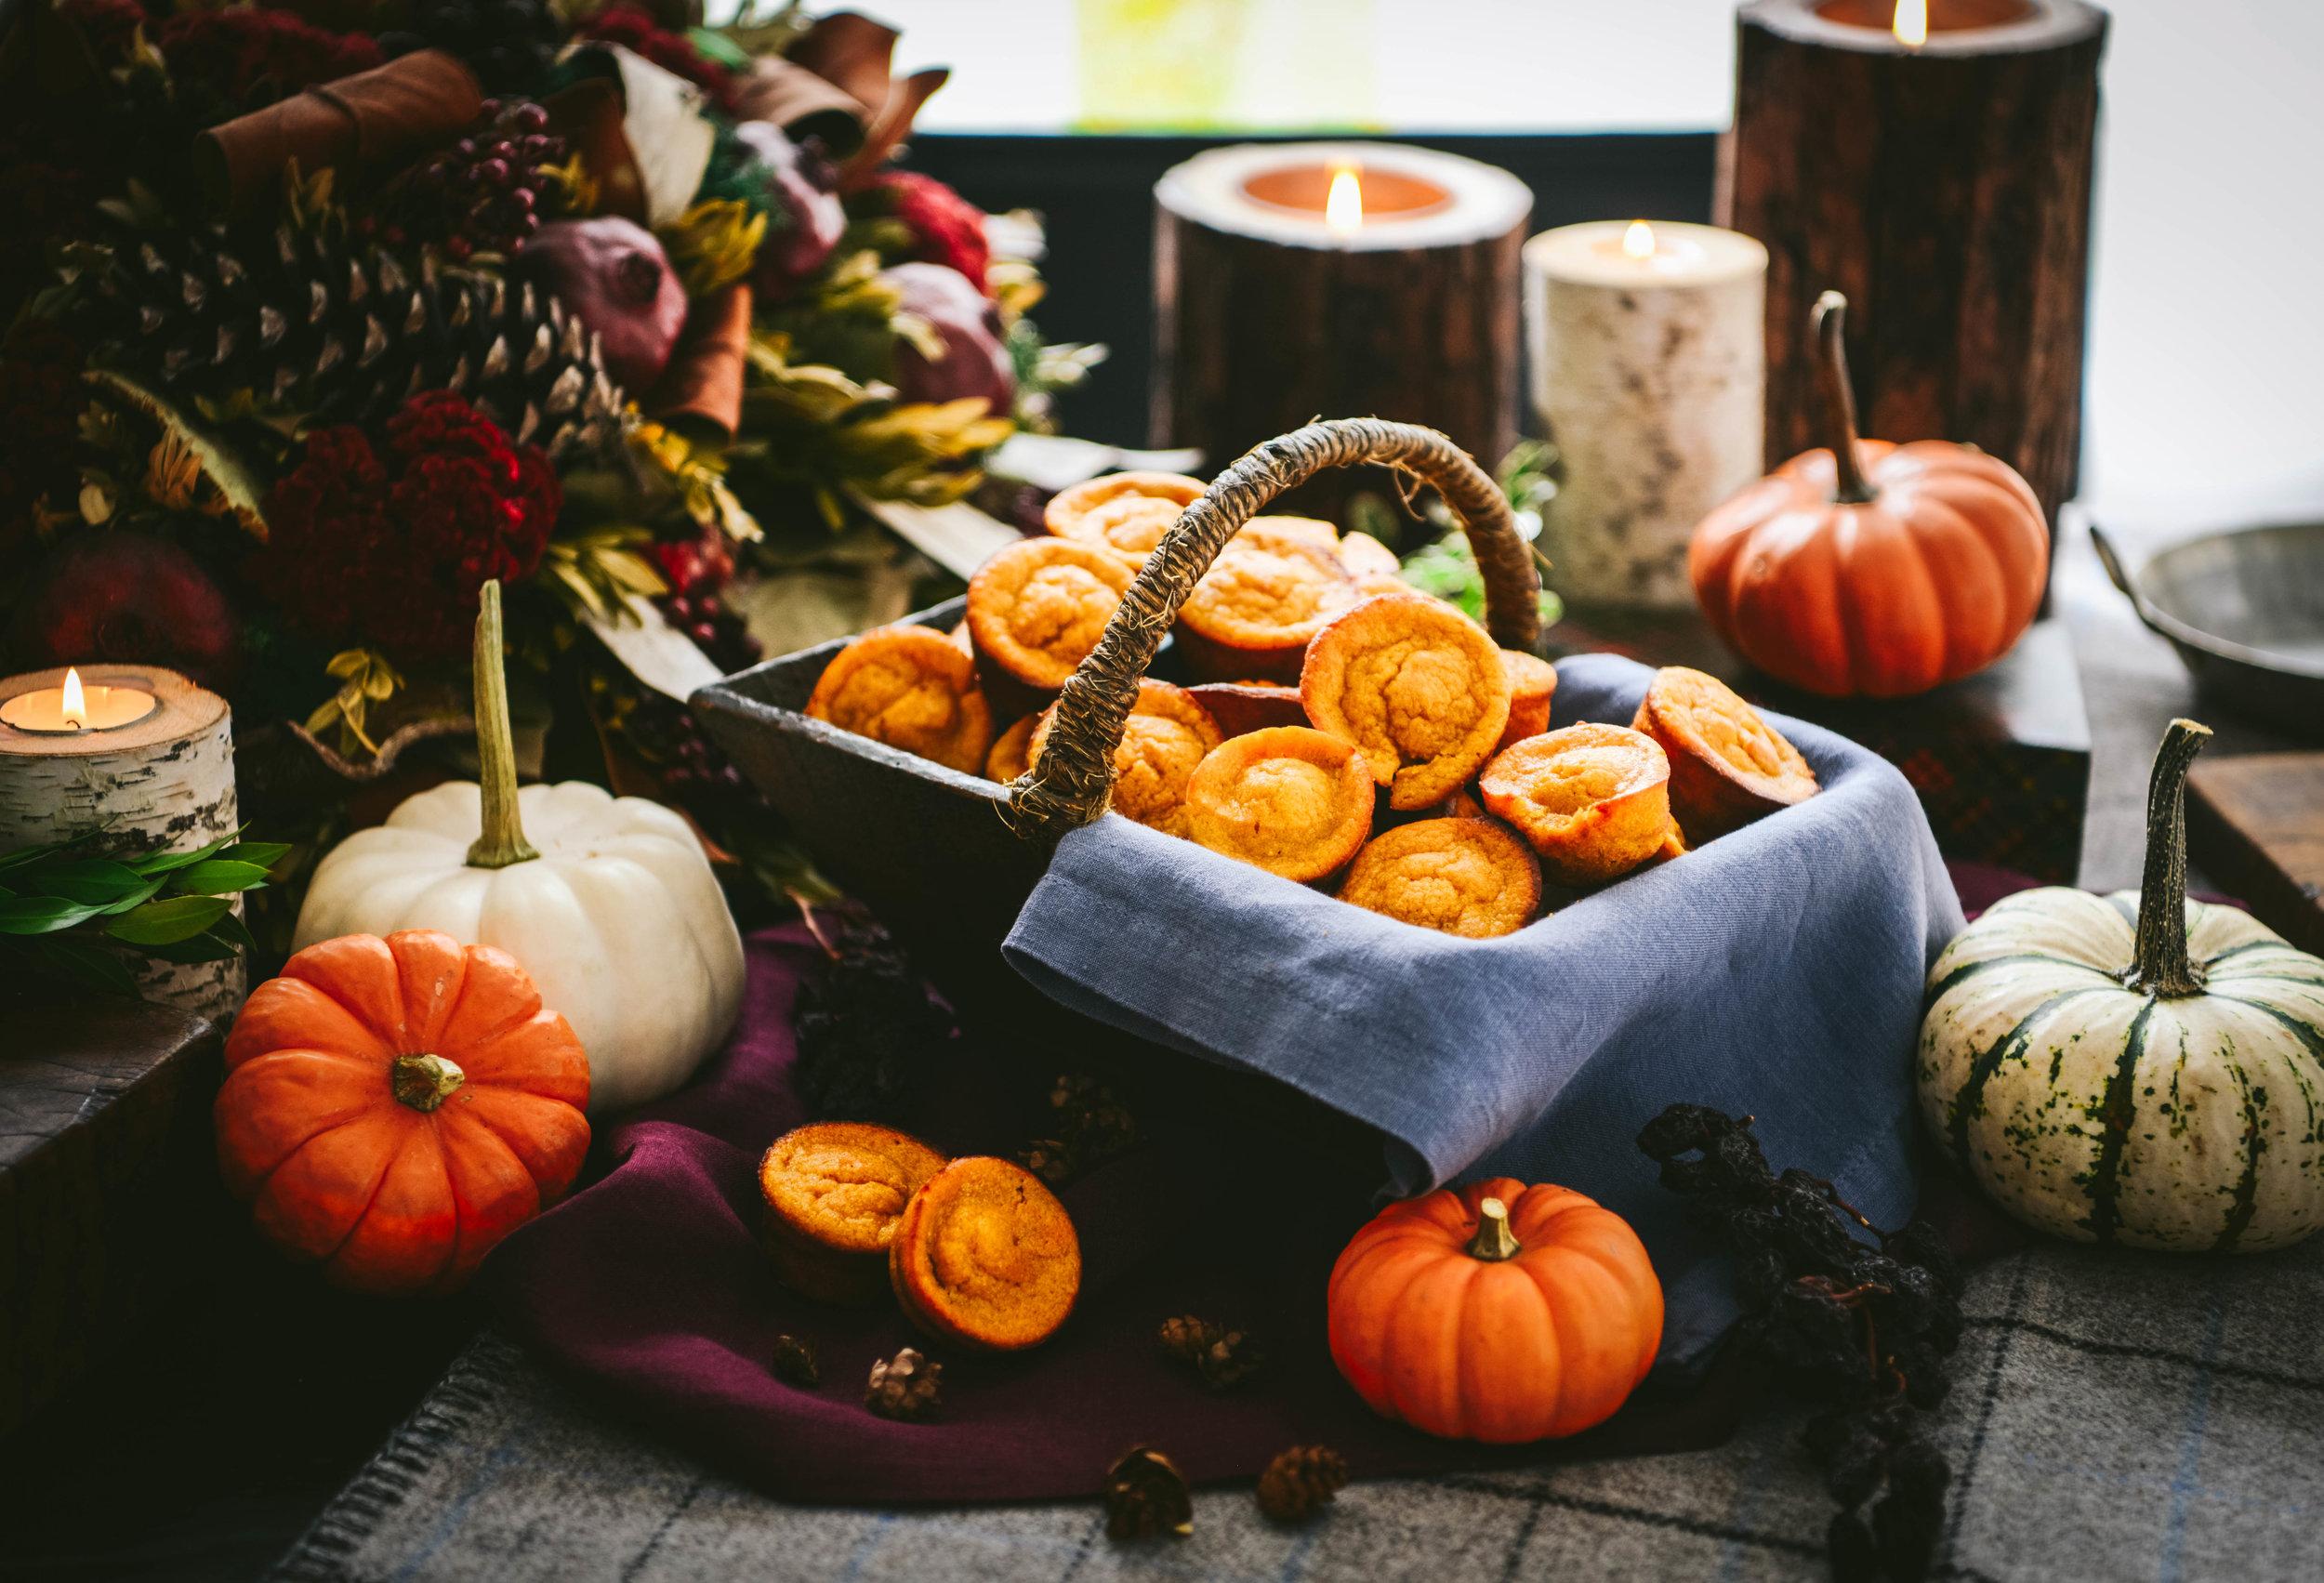 Autumn_Muffins_Weston_Table.jpg